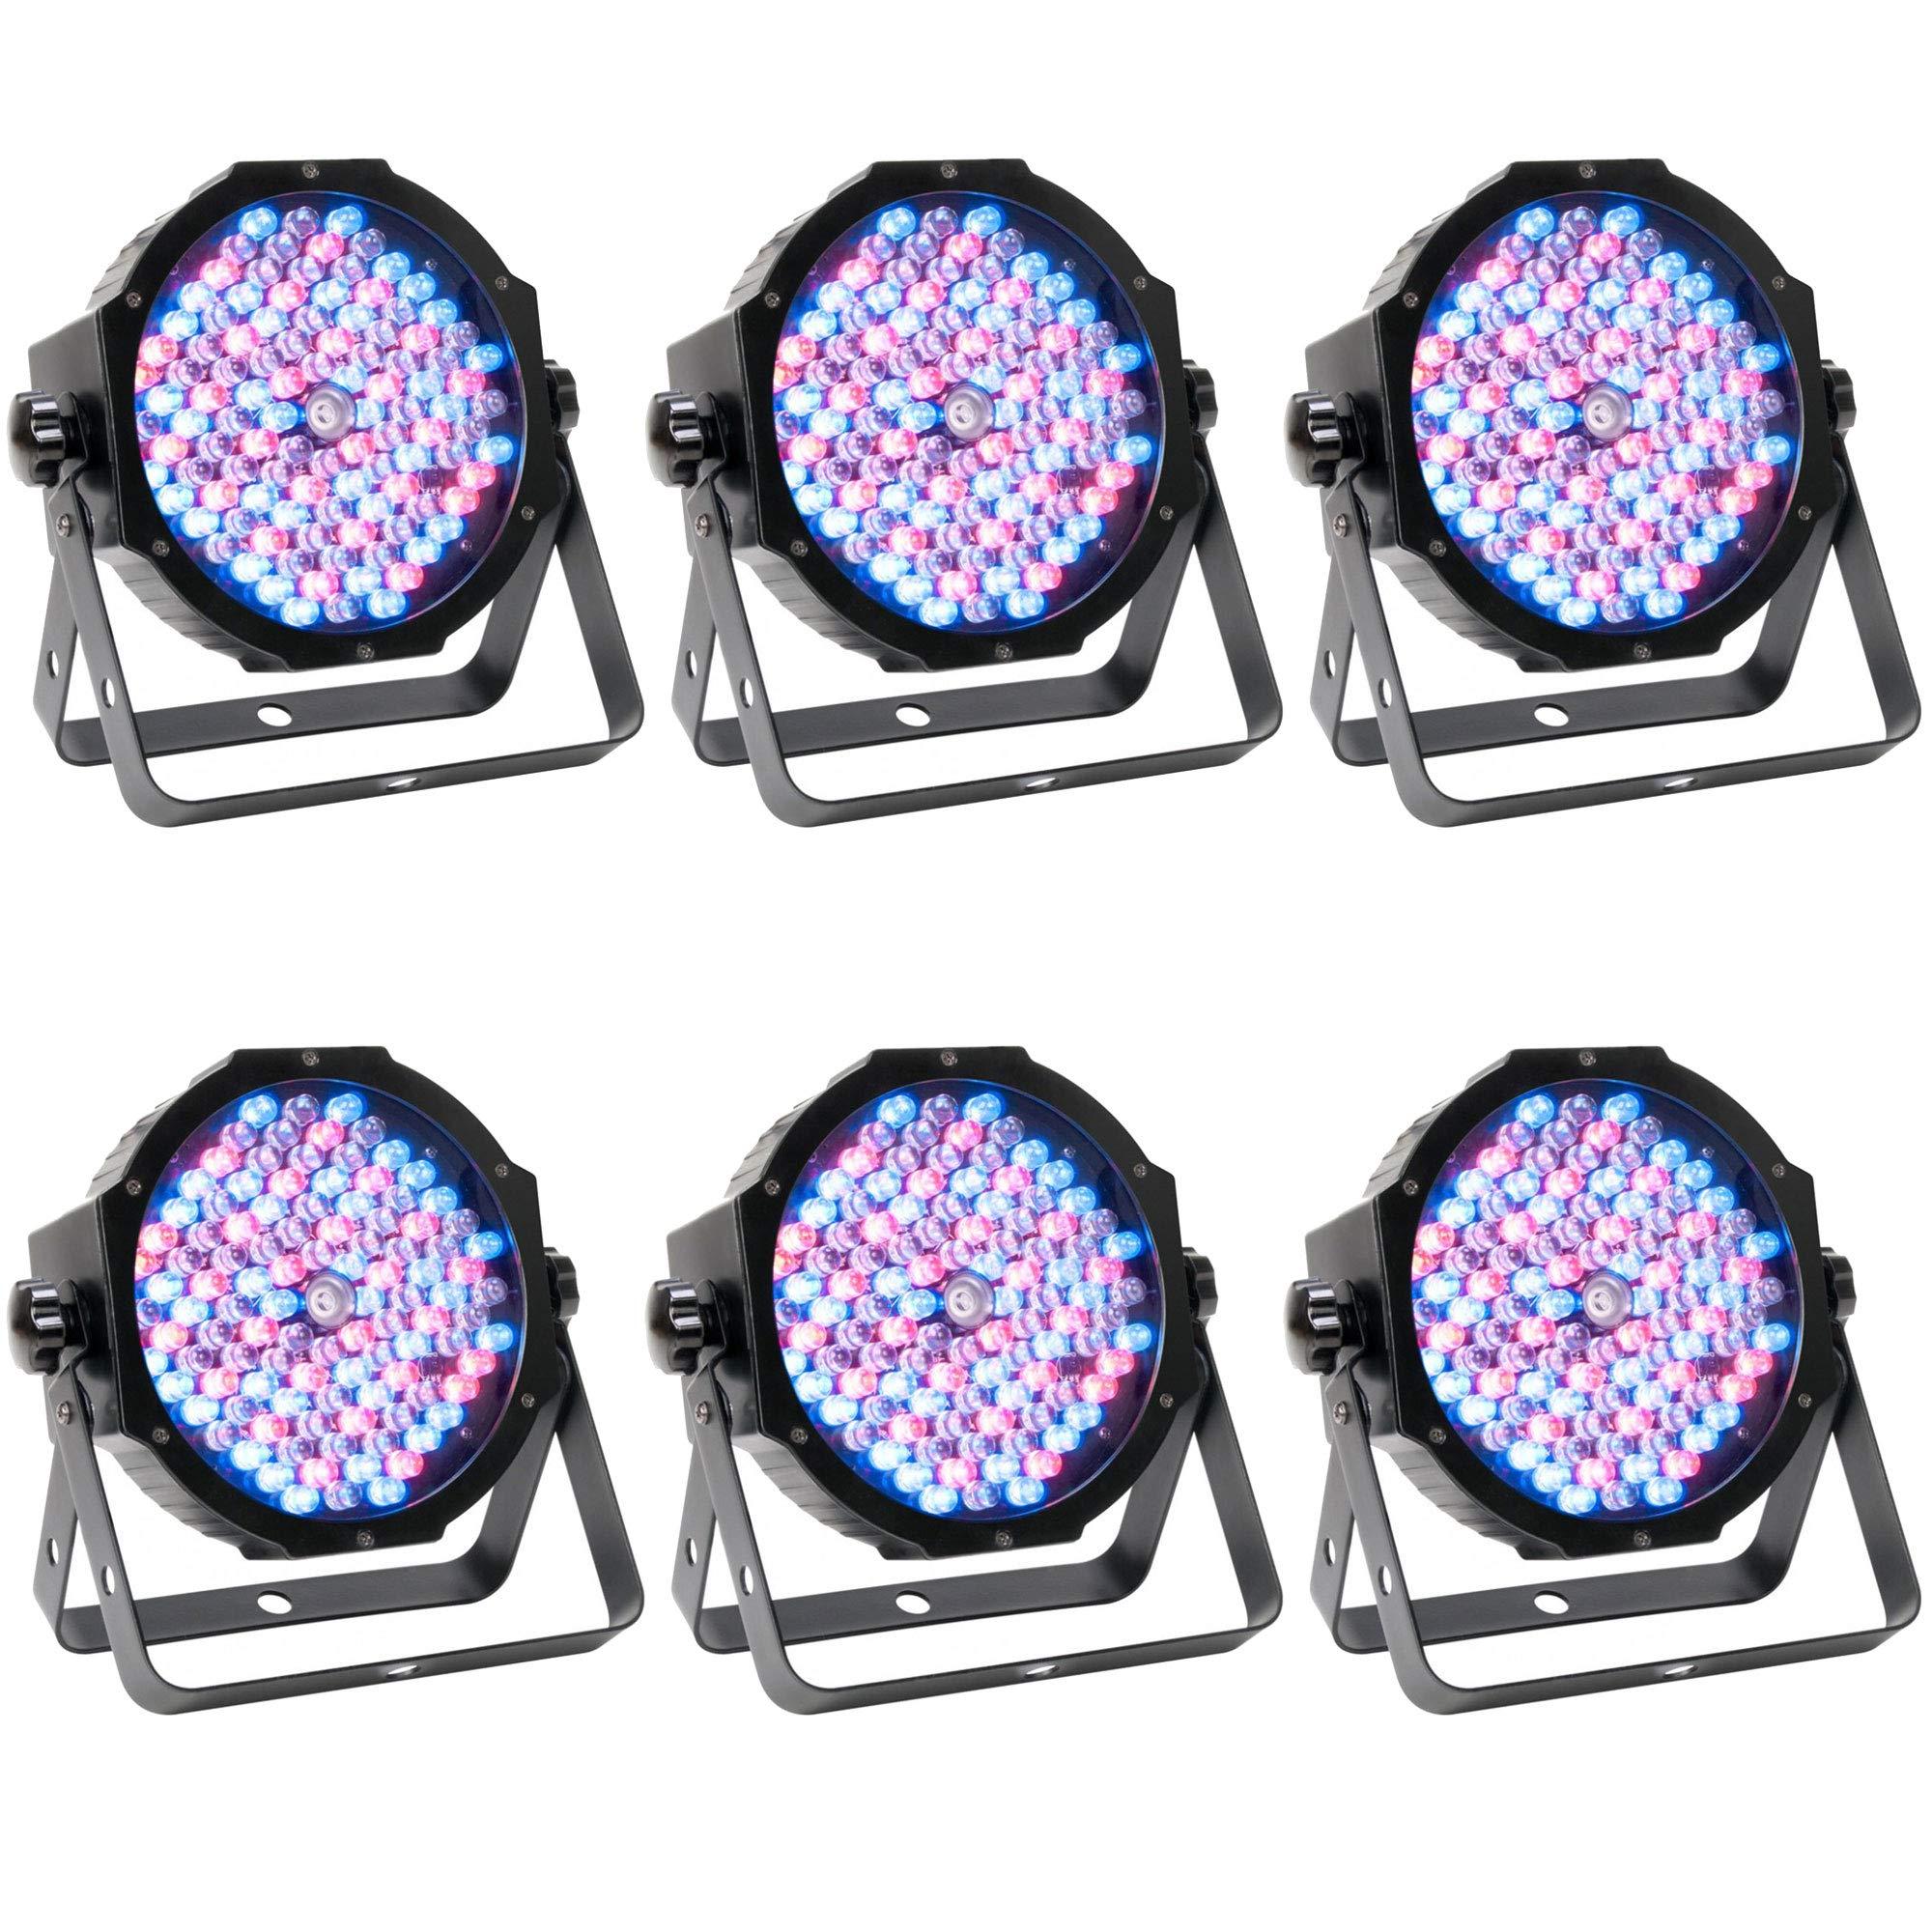 American DJ ADJ Mega Par Profile Plus LED RGB+UV Slim Par Can Wash Effect Light (6 Pack)